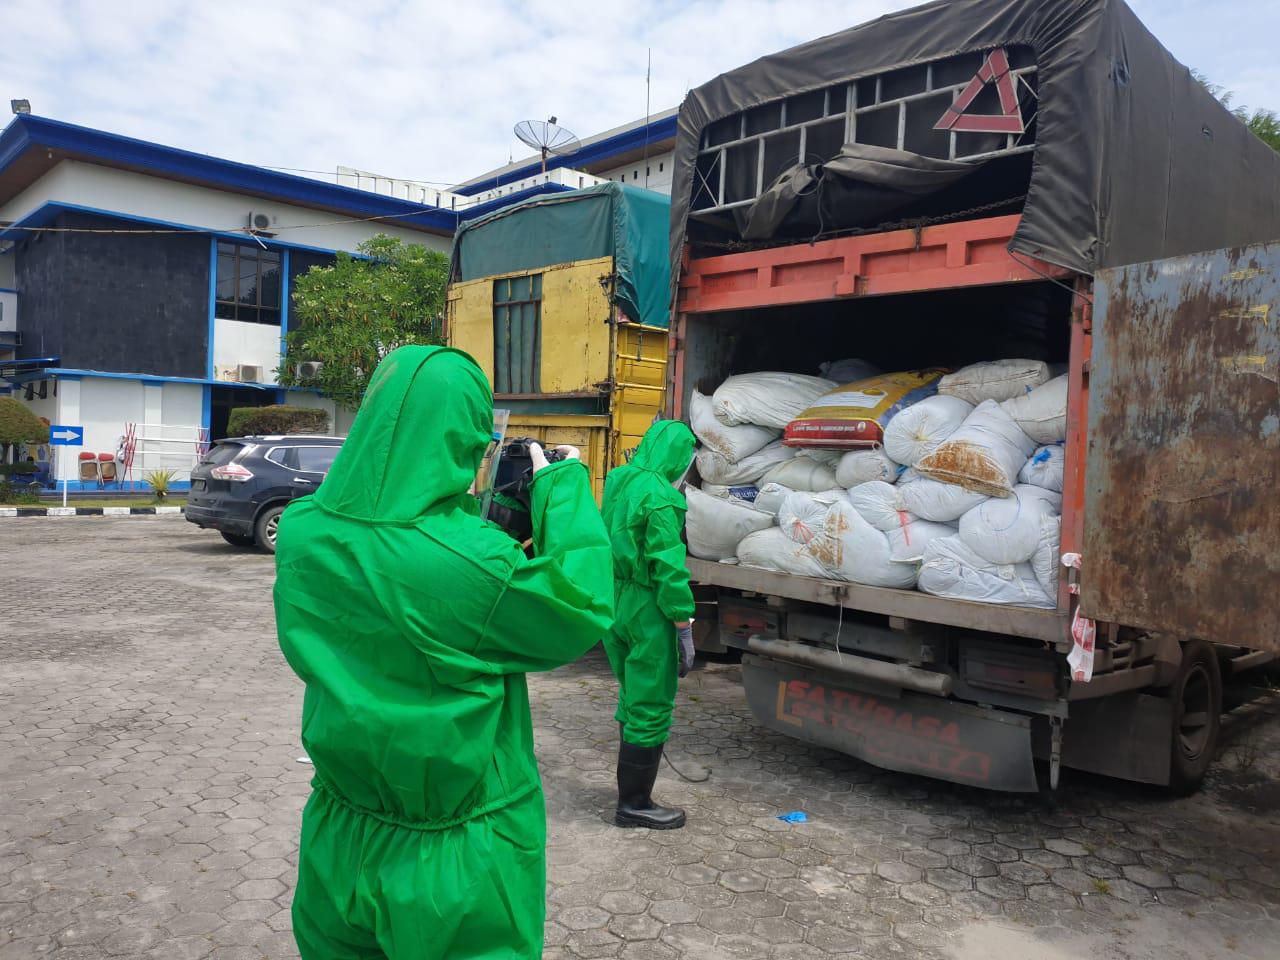 Bea dan Cukai Dumai Lakukan Penindakan Obat-obatan dan Limbah Alkes Sarung Tangan Impor